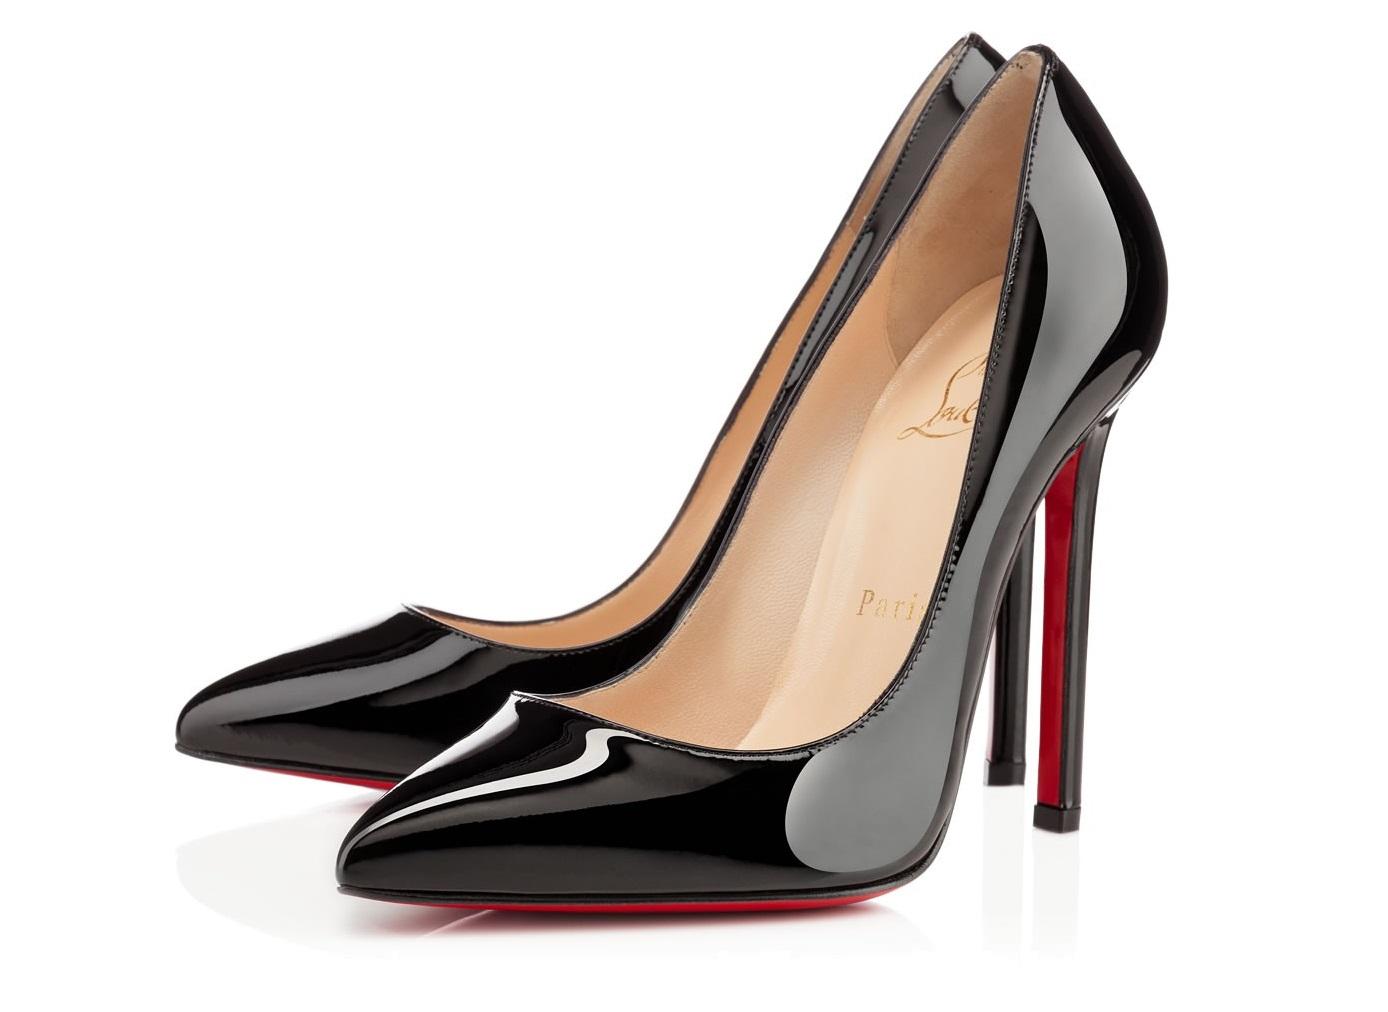 scarpe christian louboutin pigalle